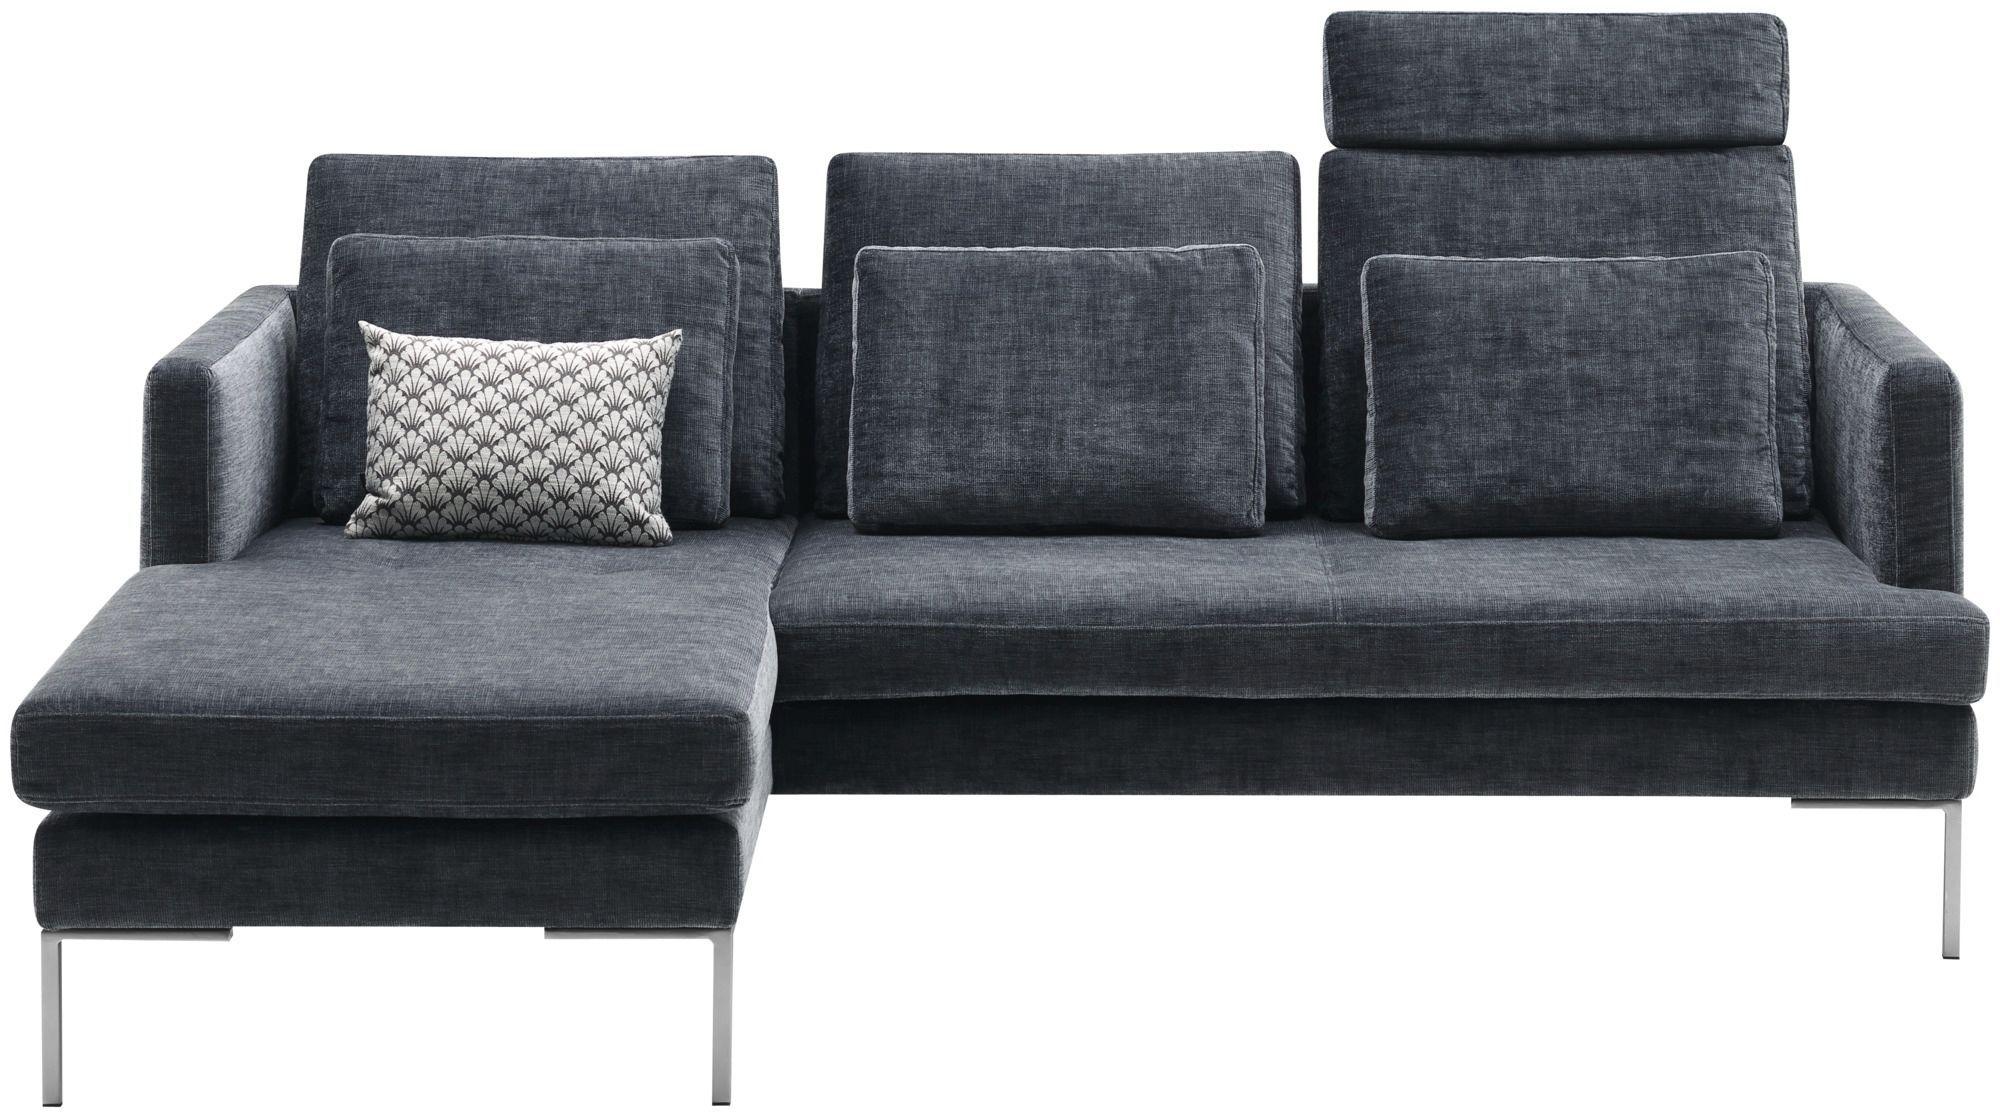 Corner sofa contemporary leather fabric ISTRA BoConcept